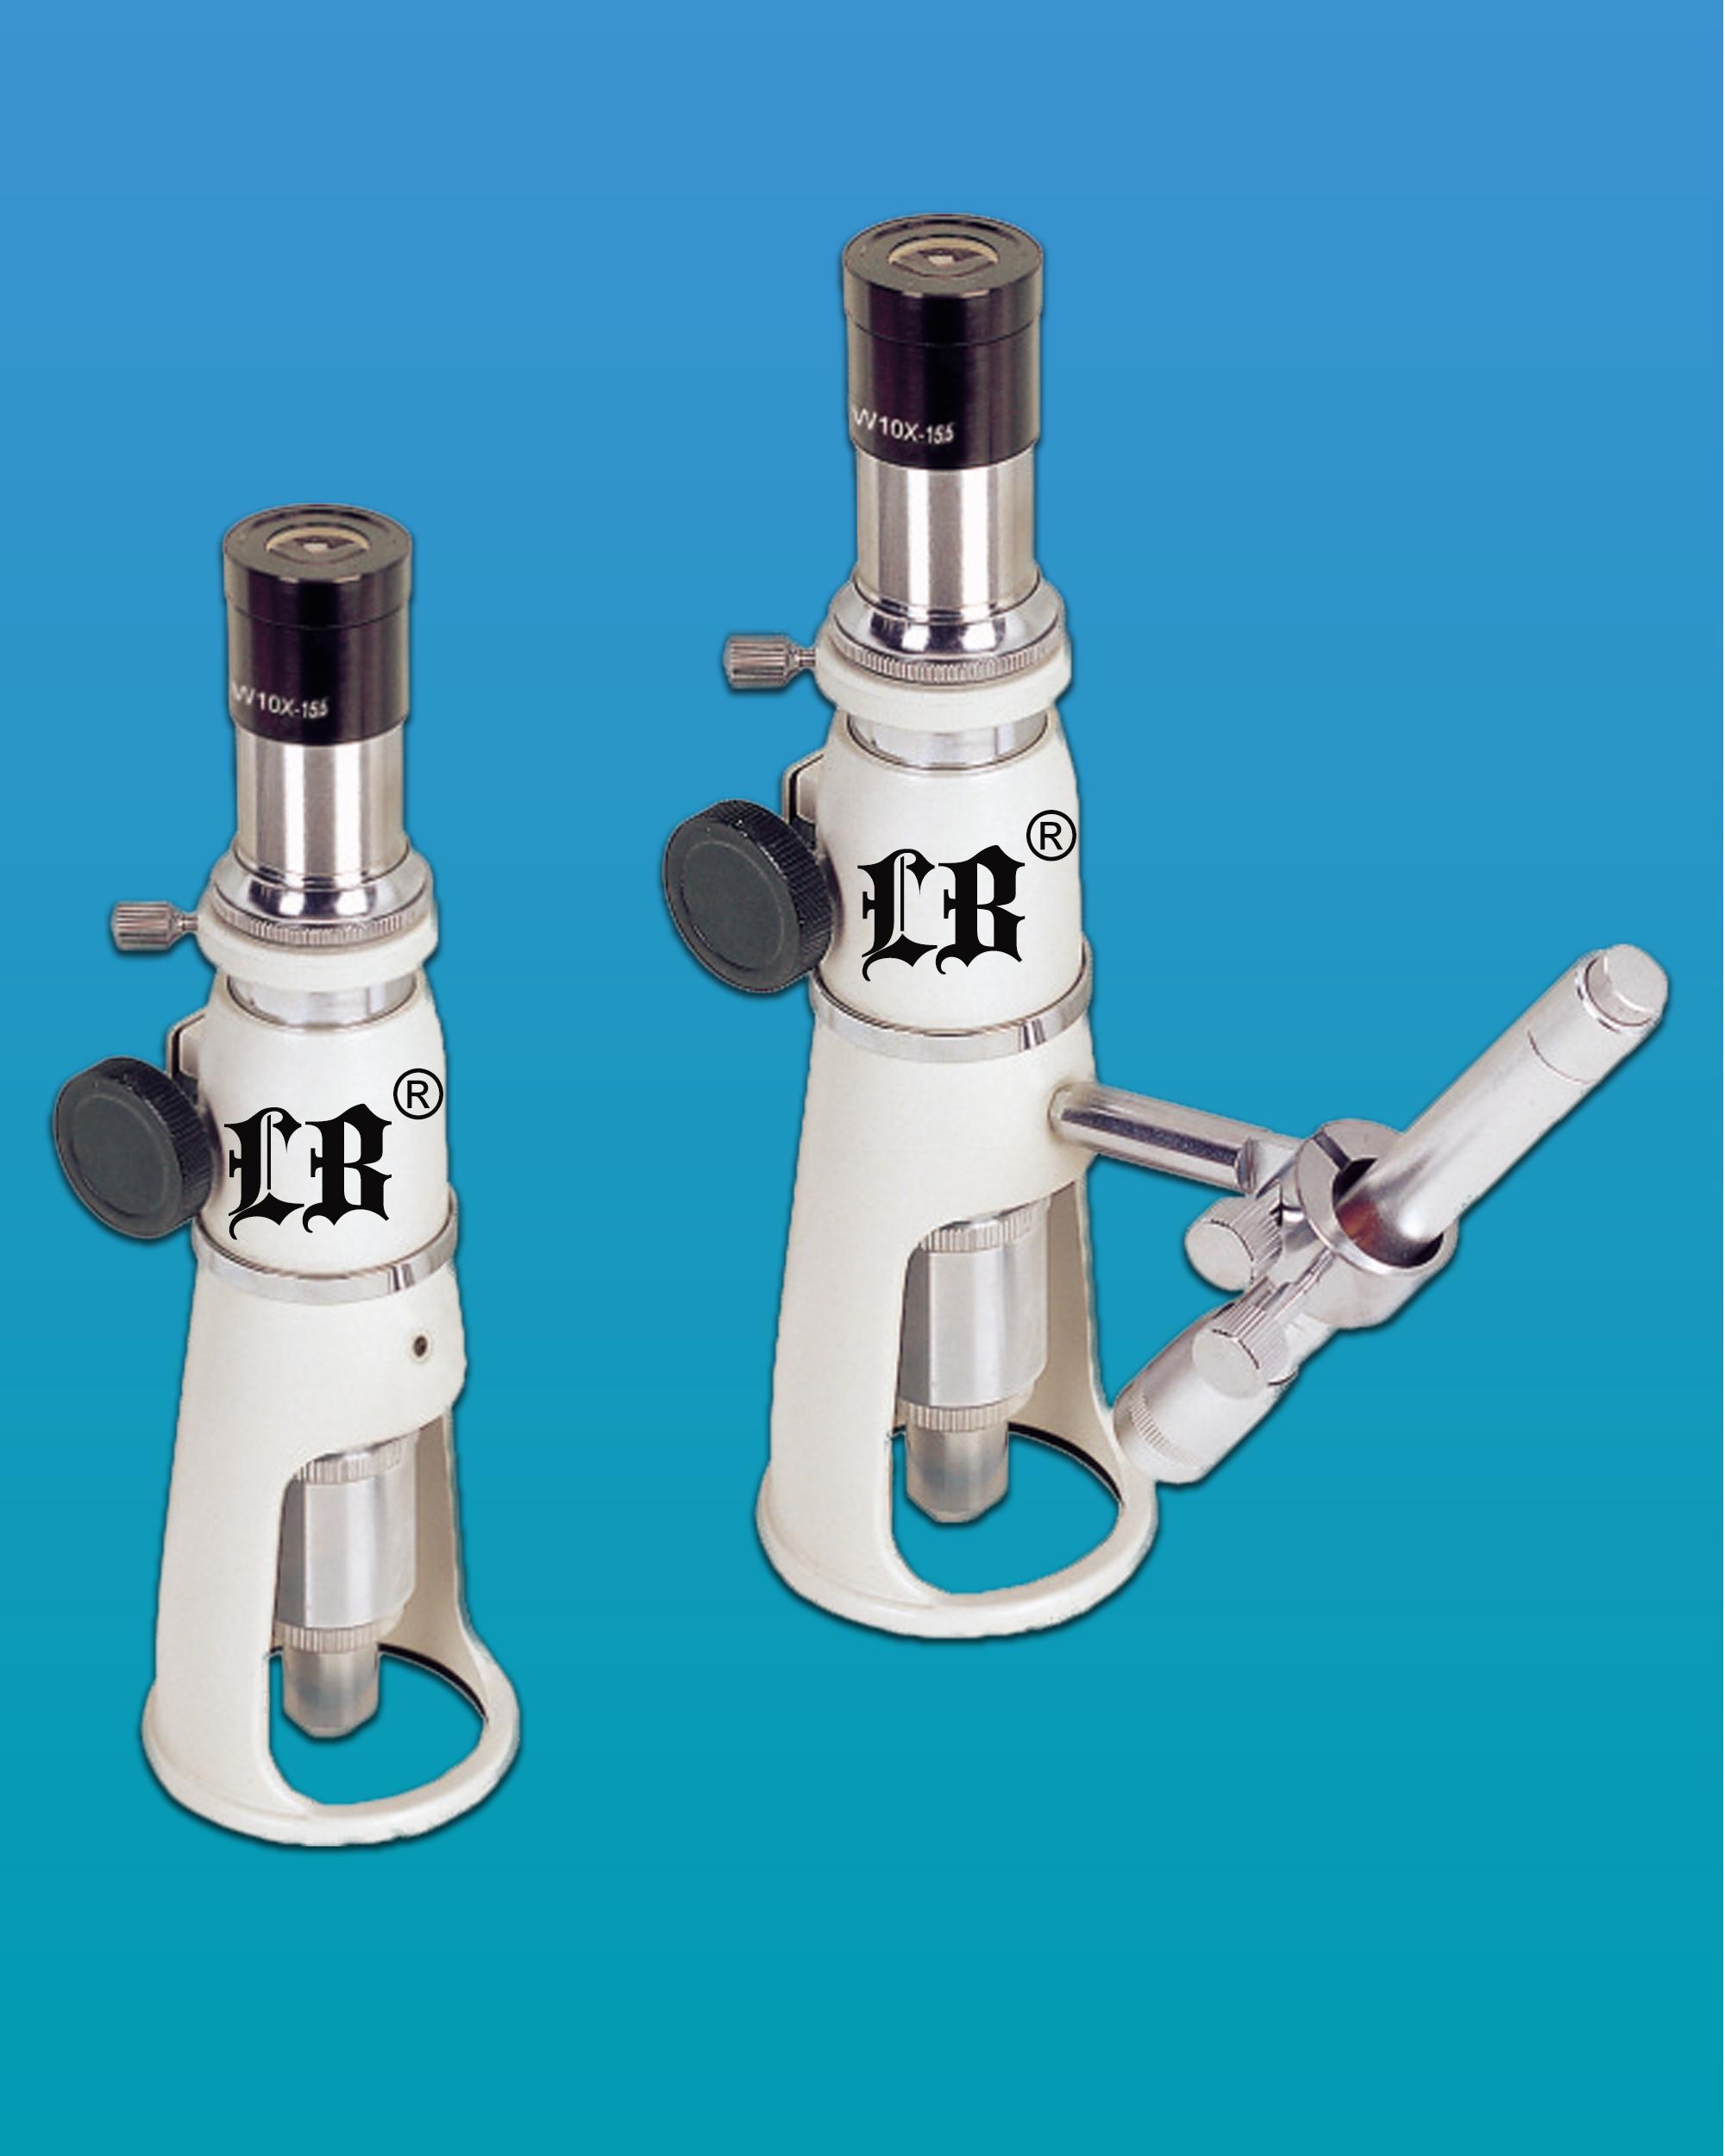 [LB-134] Portable Measuring Microscope w/ 100x Objective Zoom, Pen Light Illumination & Holder